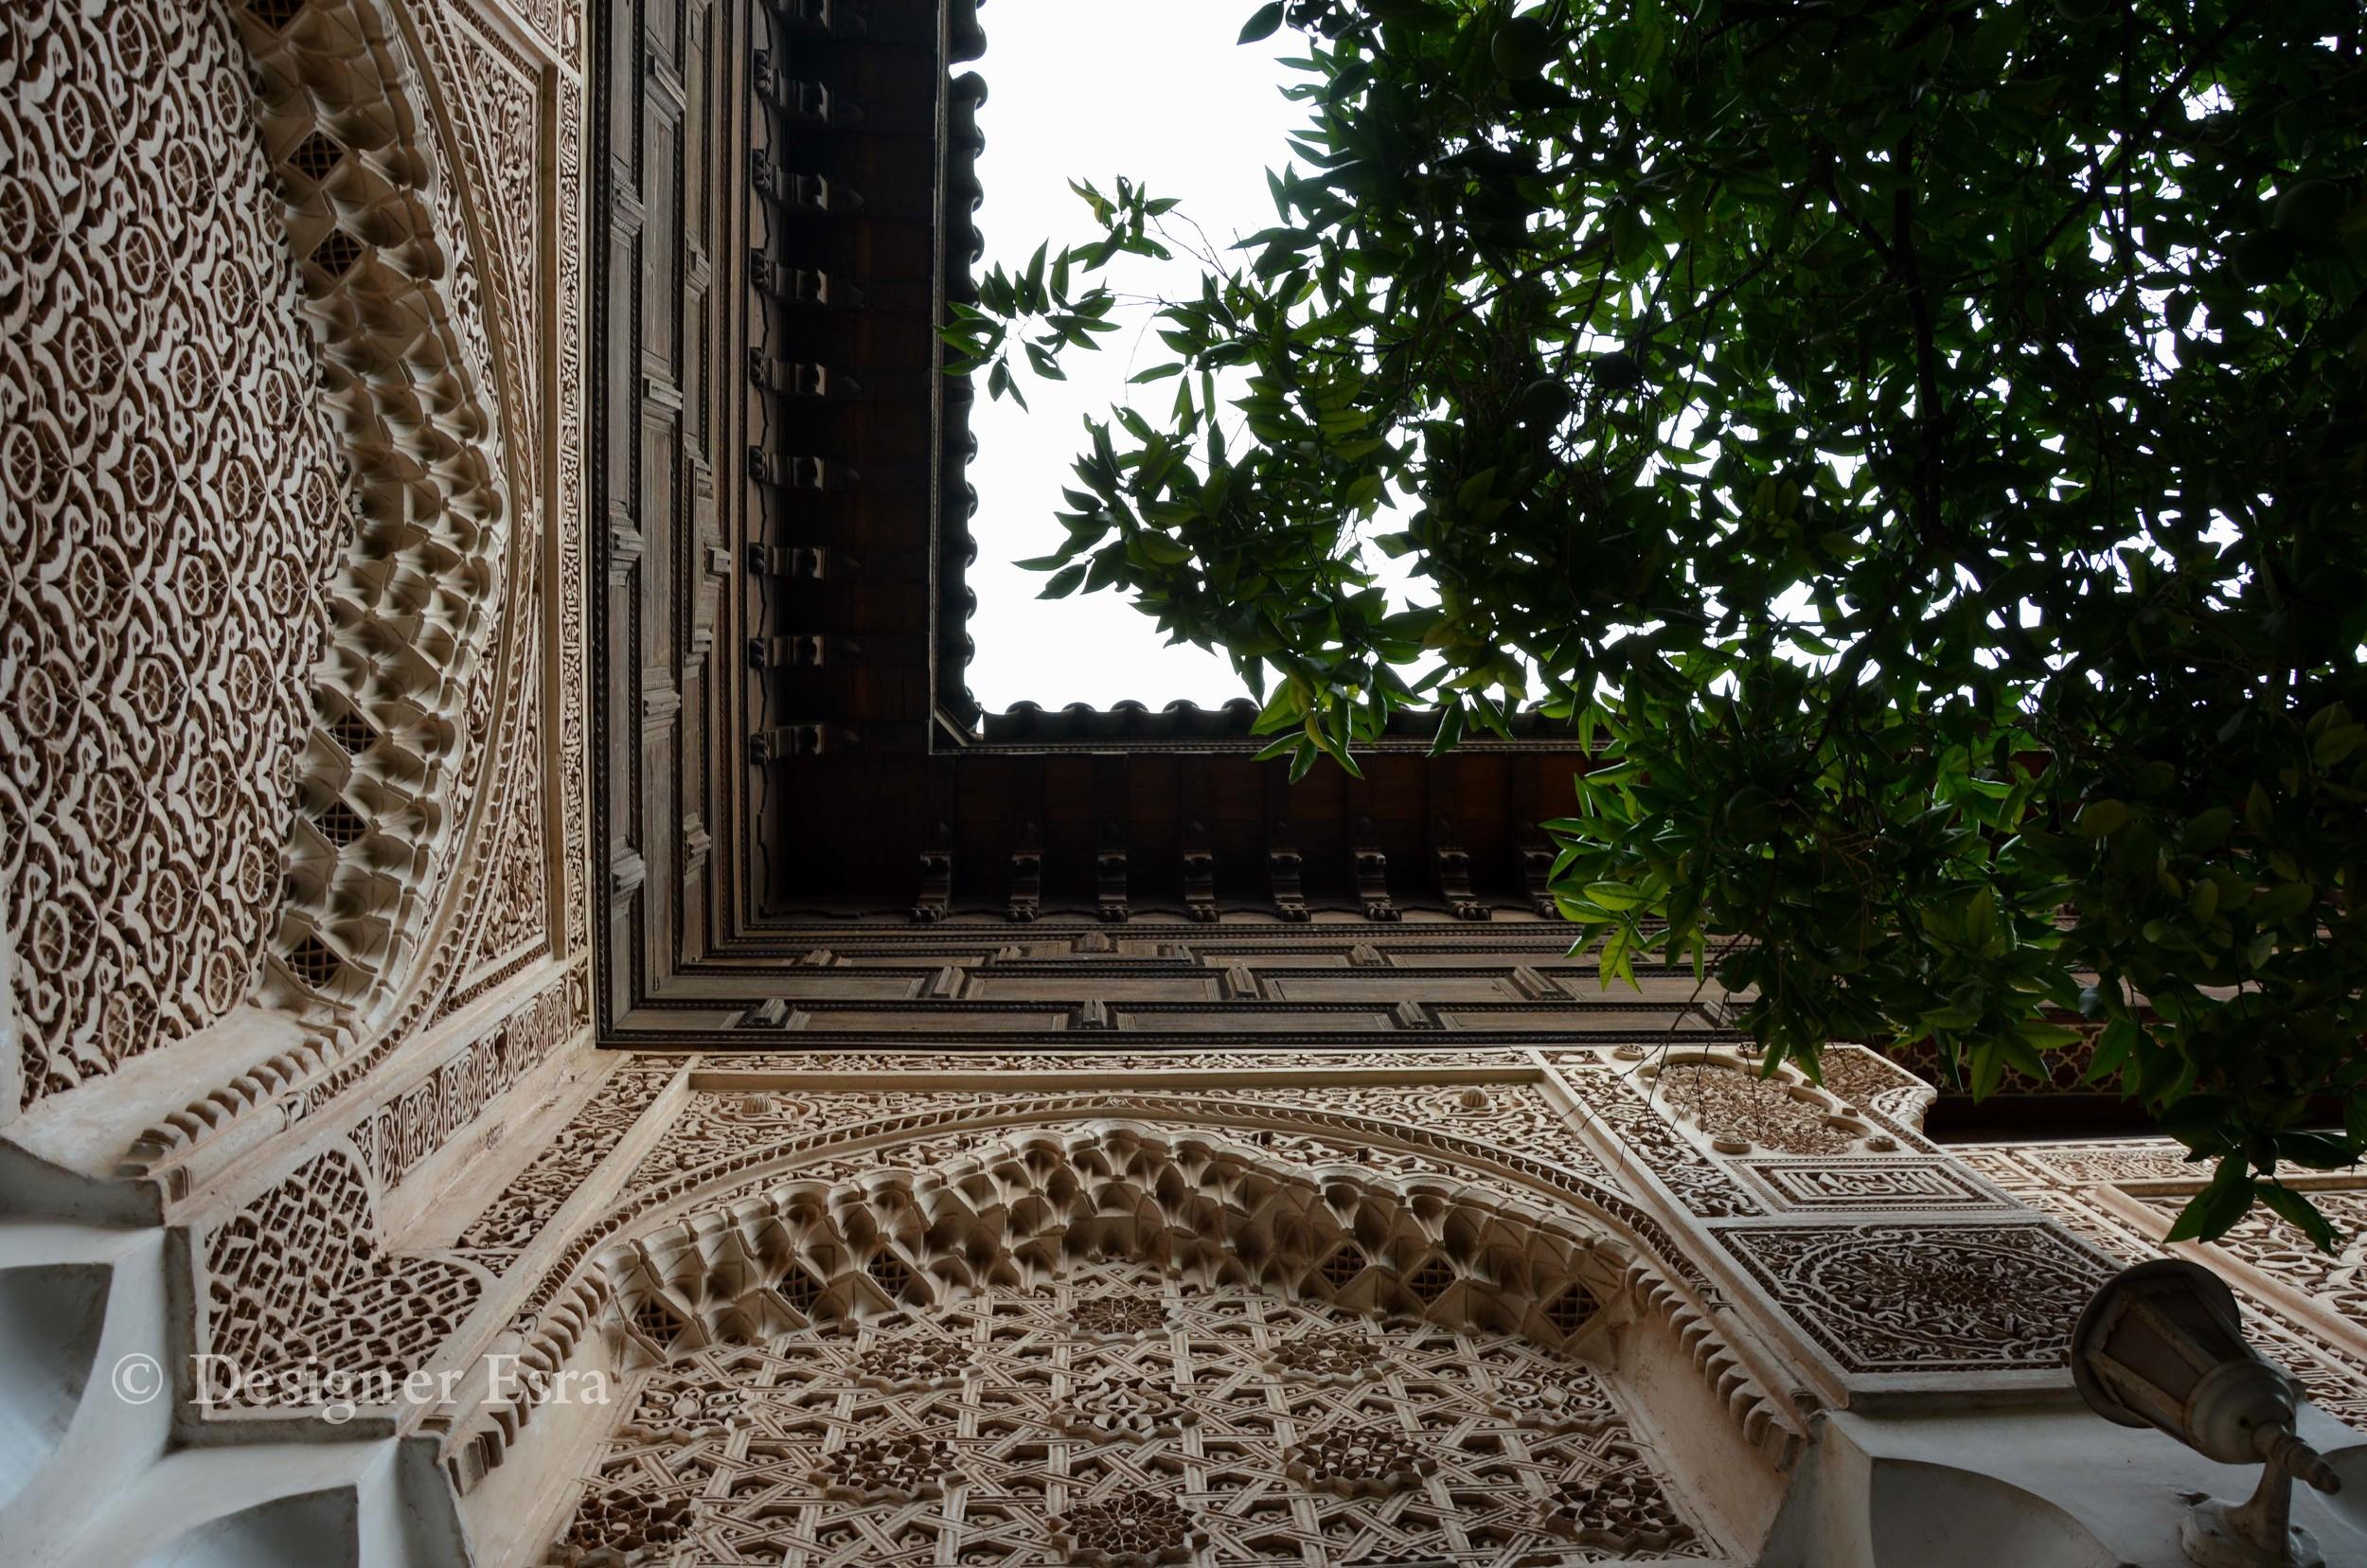 Islamic Patterns in Bahia Palace